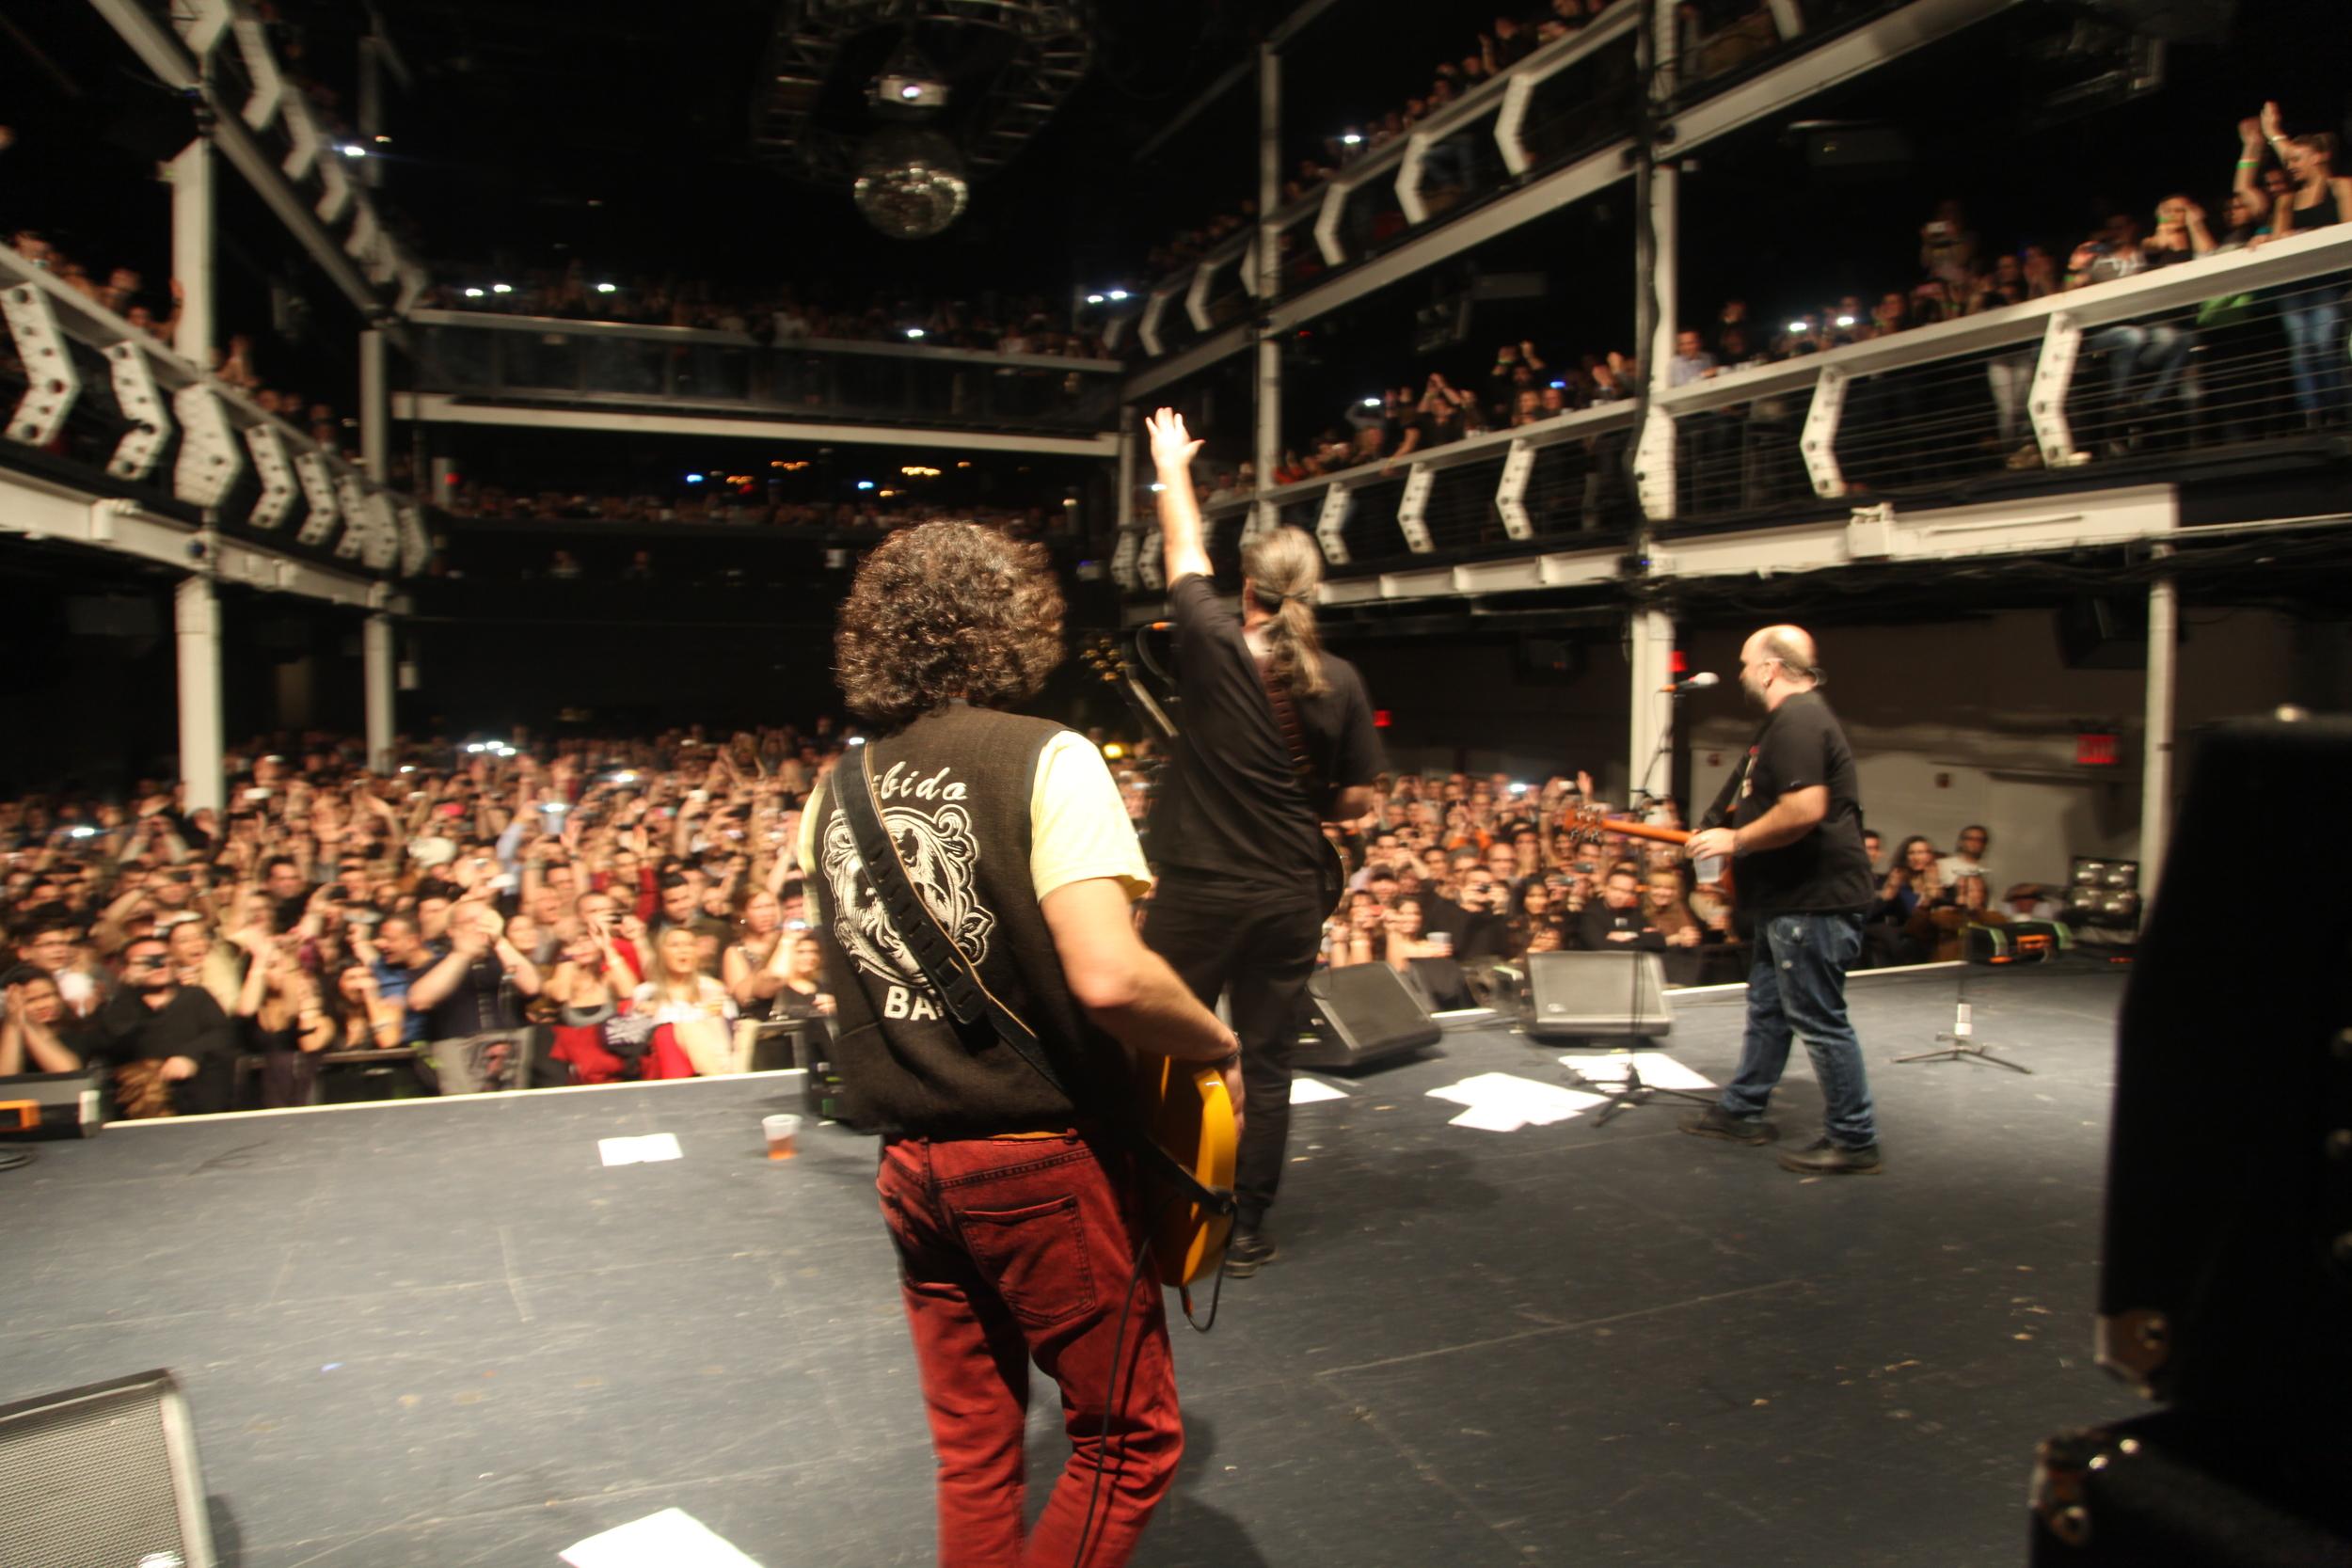 Pyx Lax Final Reunion Tour 2012